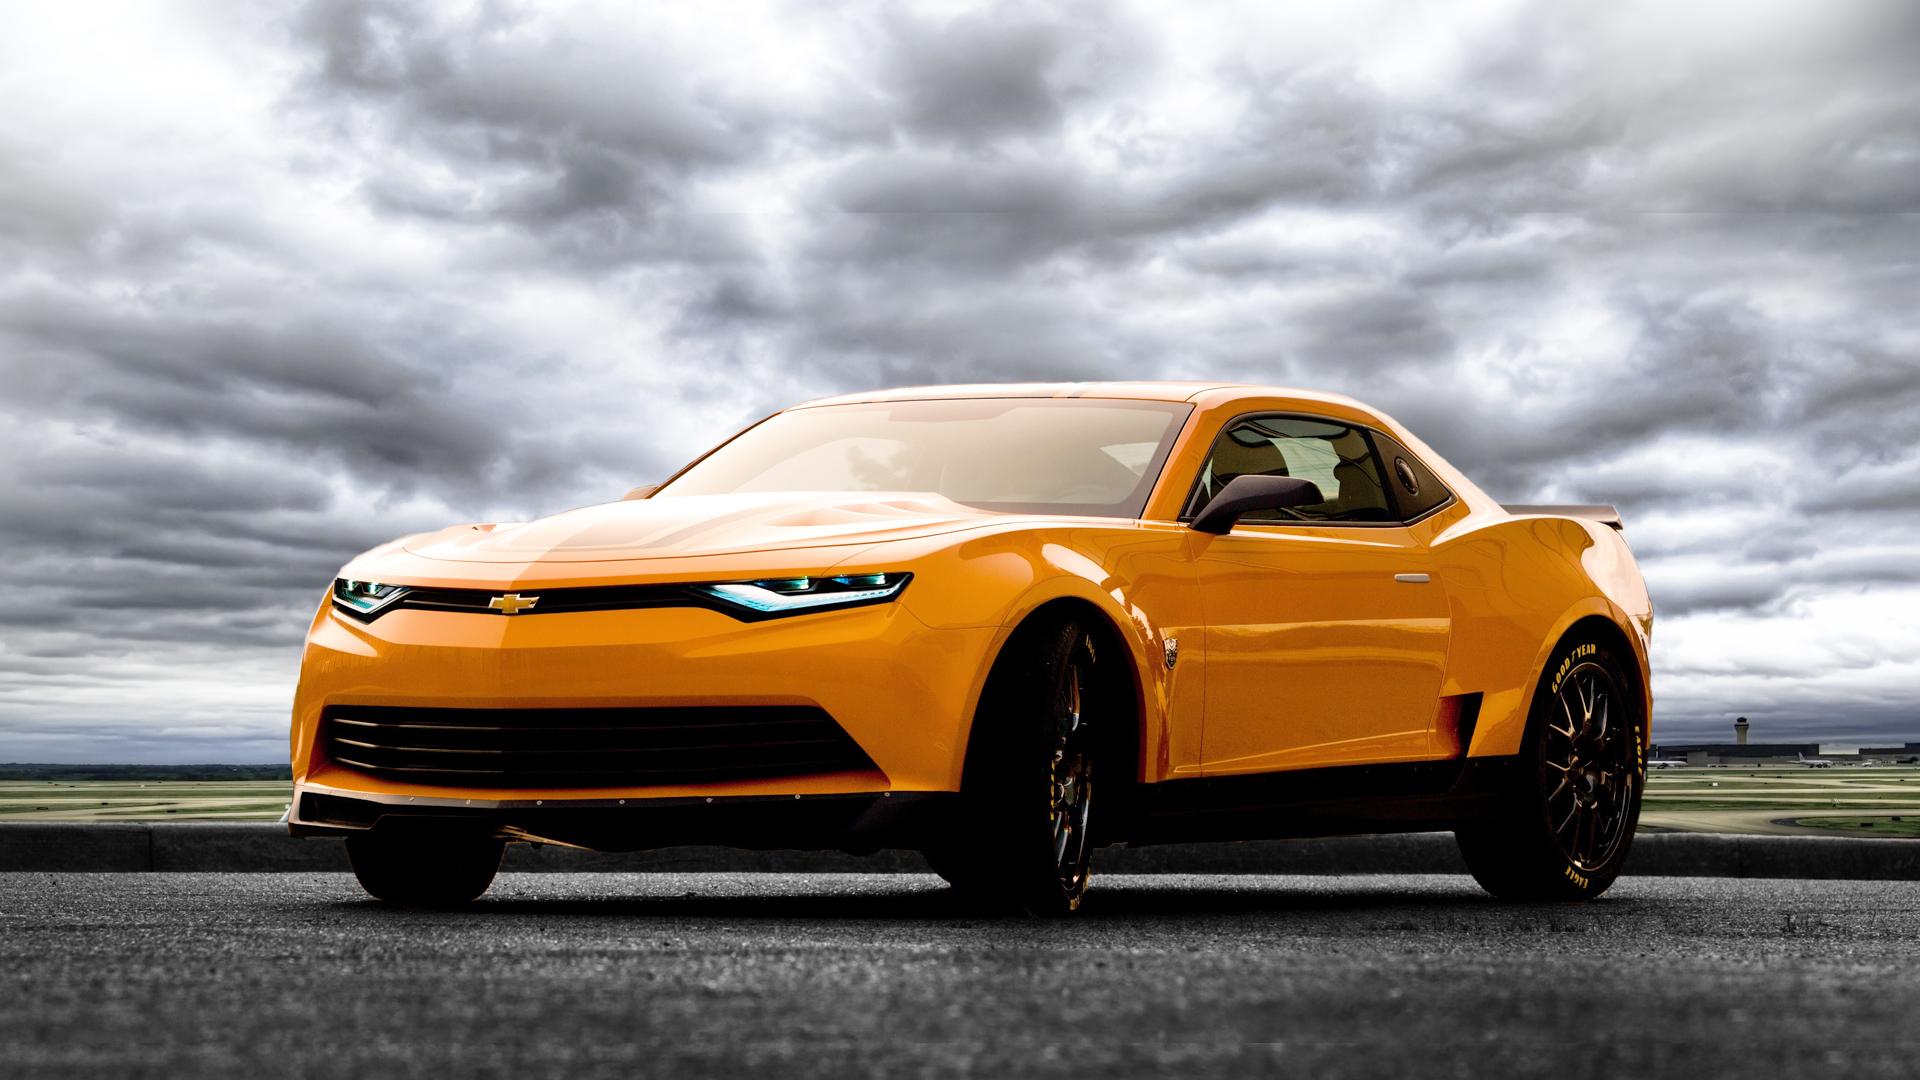 Car Drifting Wallpaper Hd 1080p Revelan Al Nuevo Bumblebee De Transformers 4 Cine Pericias